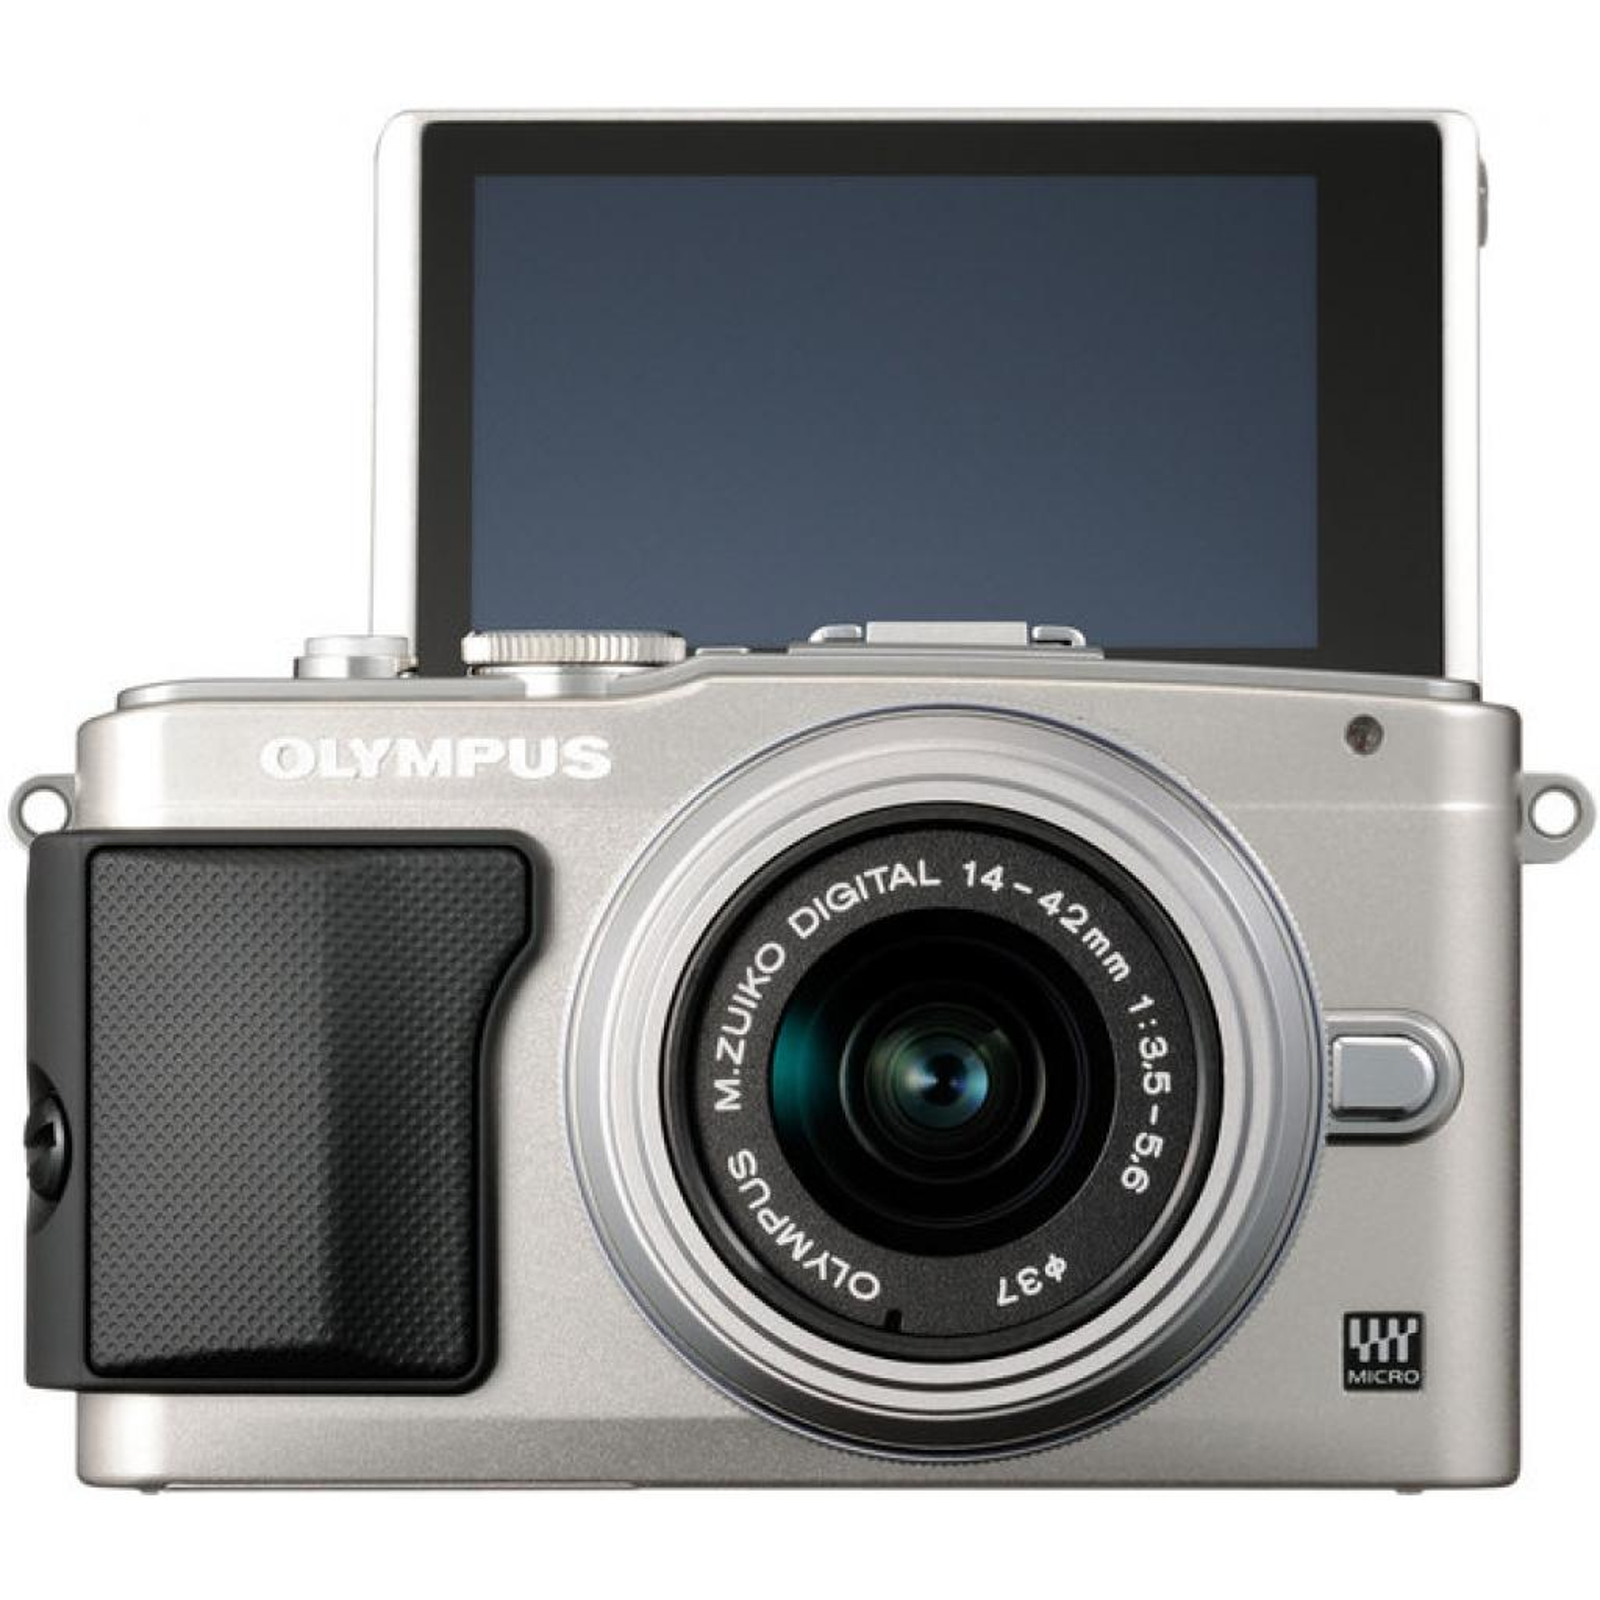 Цифровой фотоаппарат OLYMPUS E-PL5 14-42 mm silver/silver (V205041SE000) изображение 2